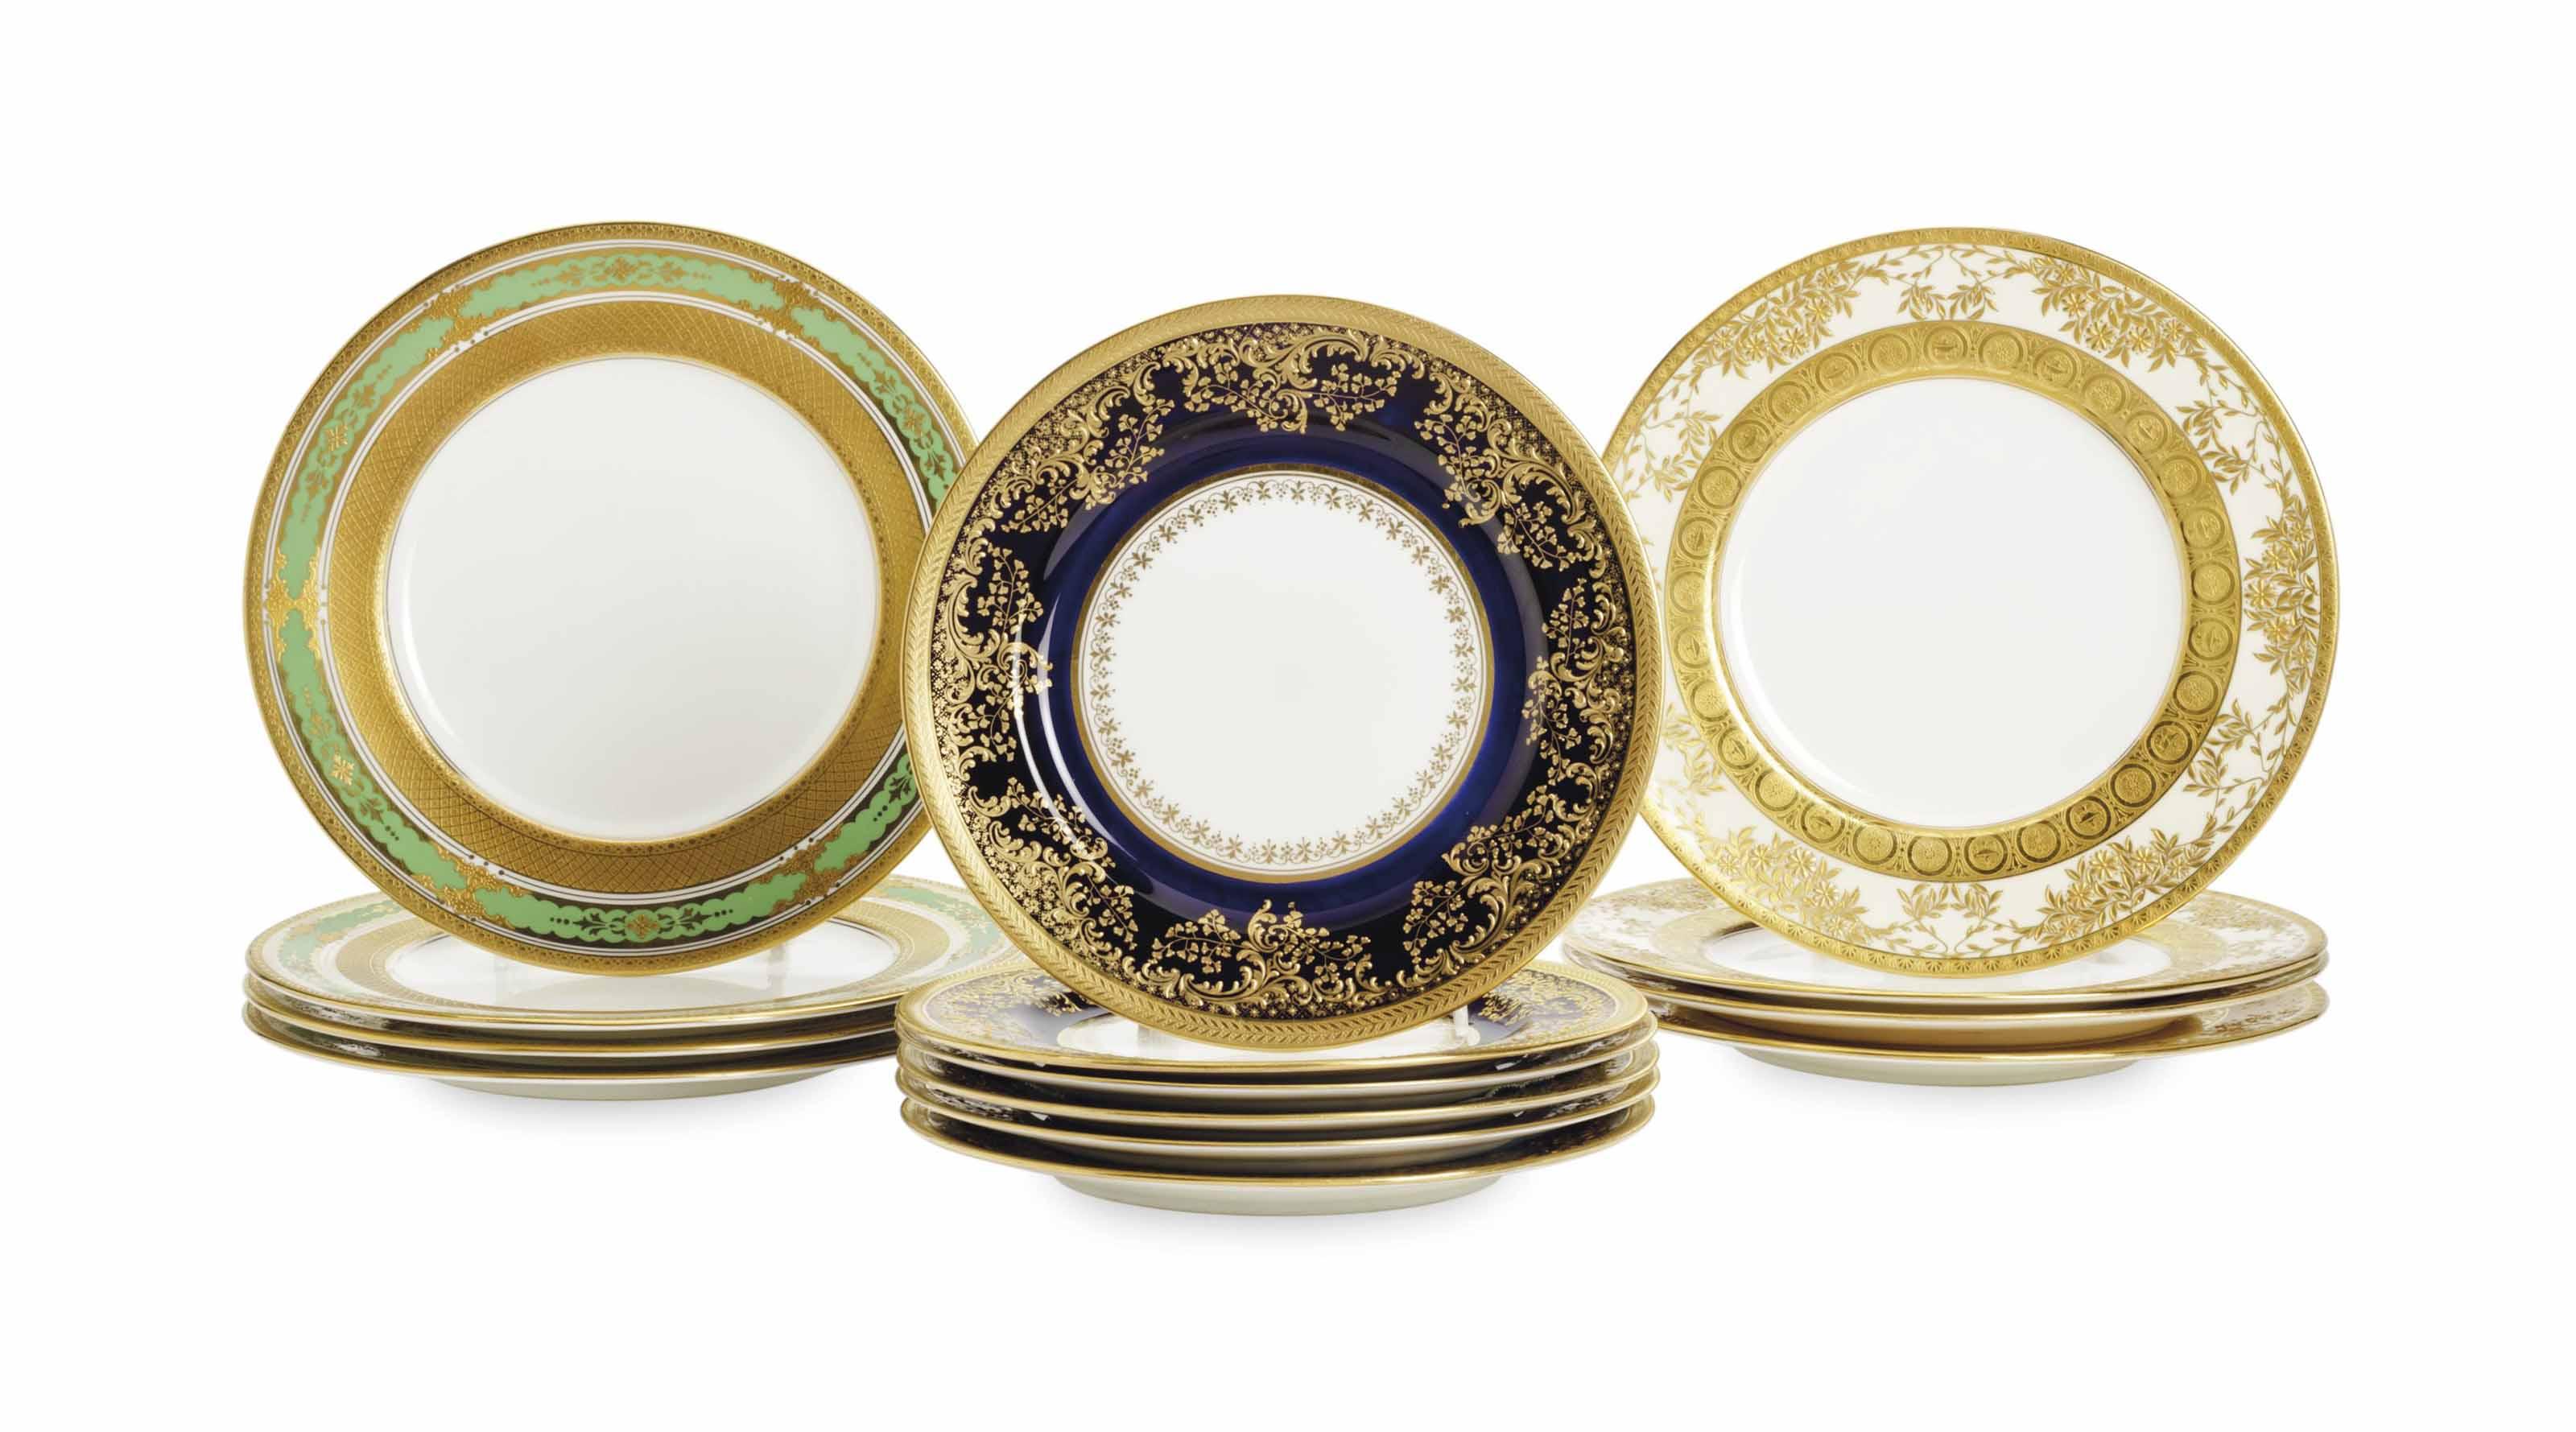 THREE SETS OF ENGLISH GILT DECORATED PLATES,